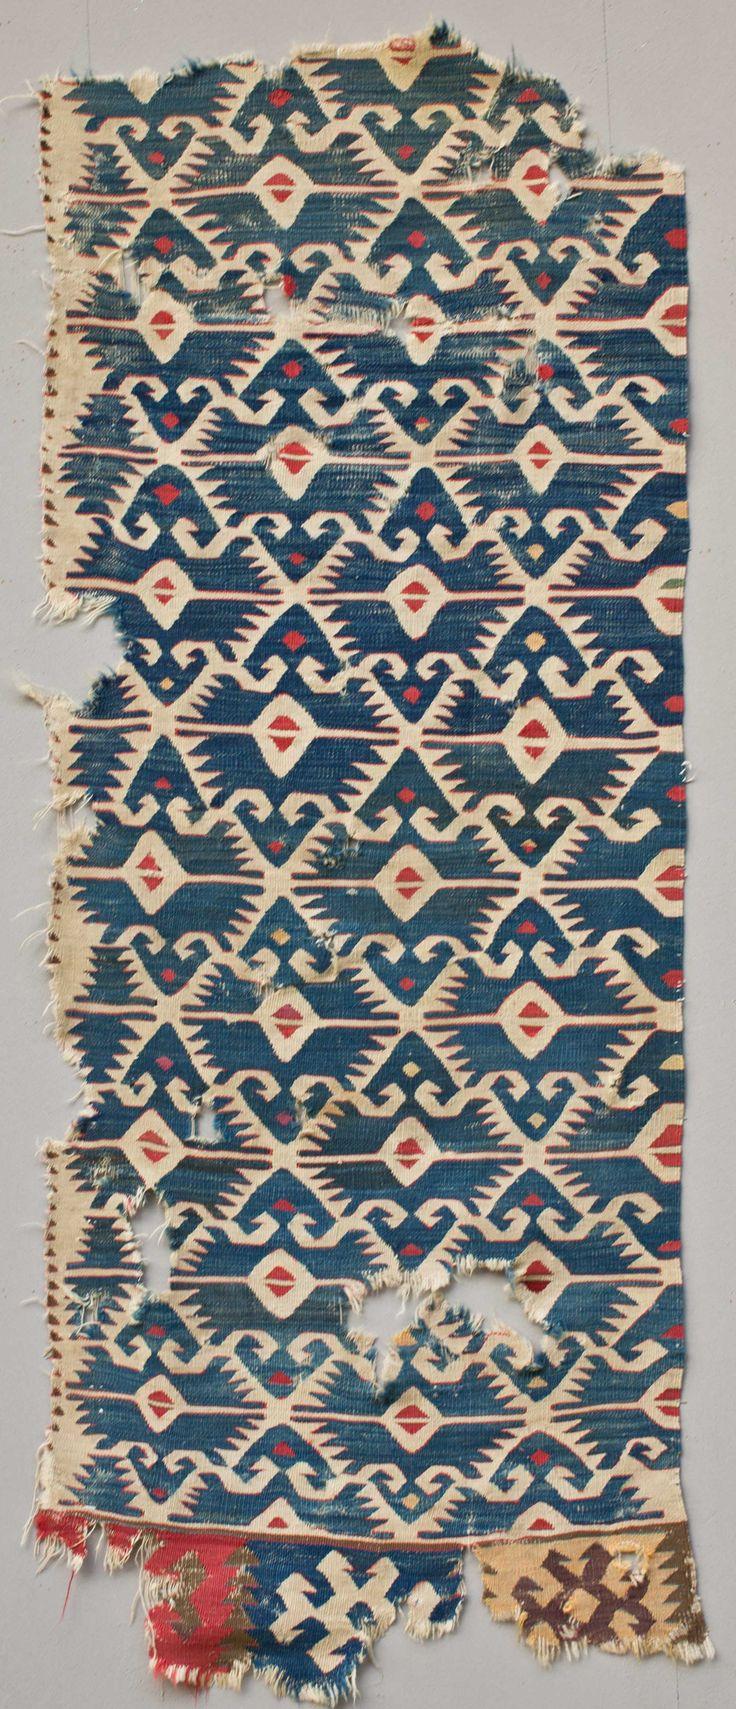 Anatolian Kilim Fragment 19th c.